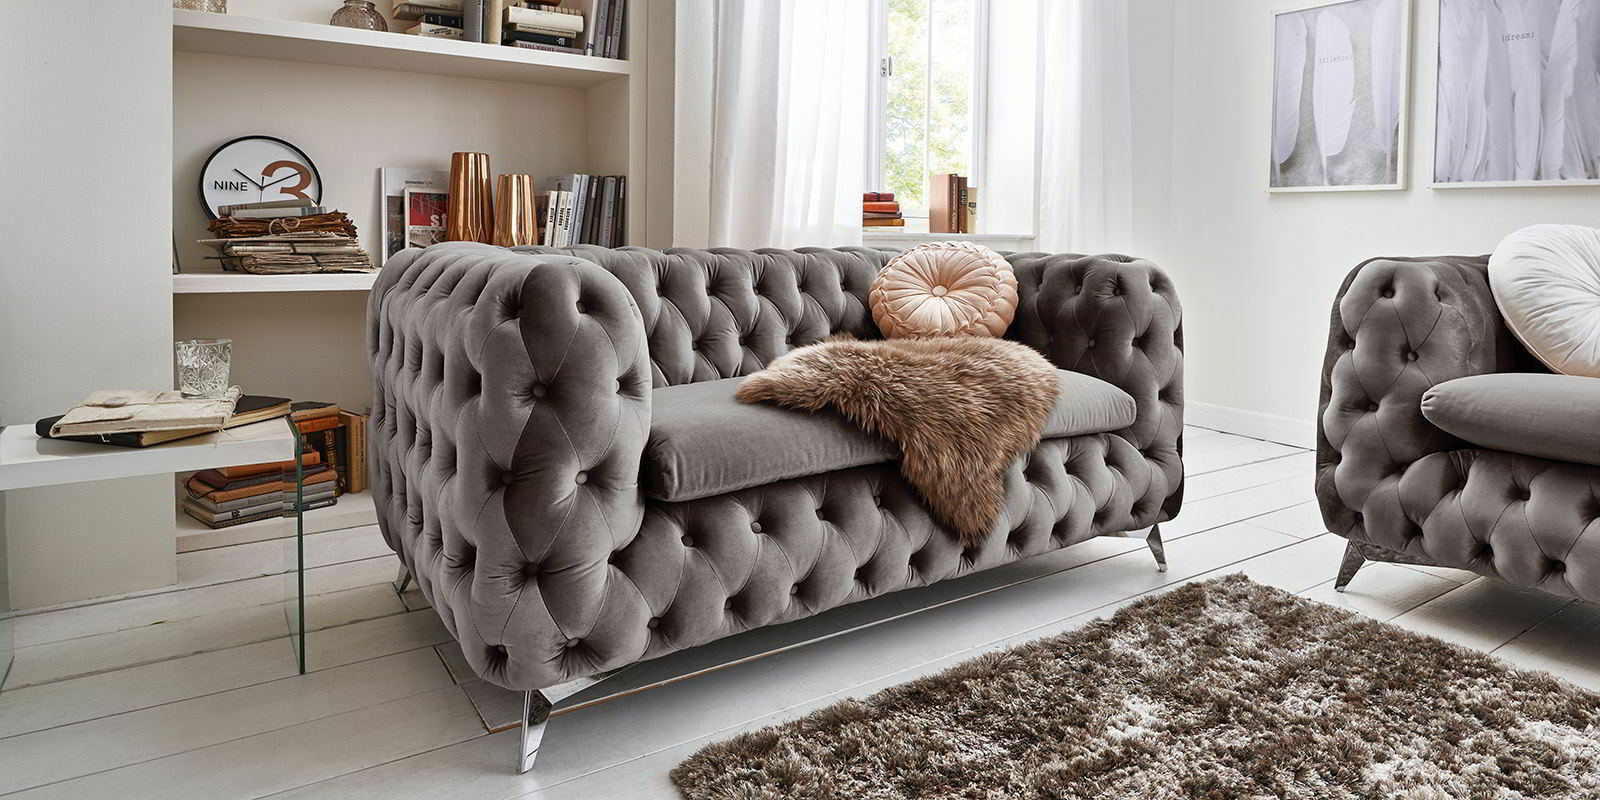 Full Size of Big Sofa Grau Stoff Grober Chesterfield Couch Reinigen Ikea Kaufen Breit Leder Bezug Großes Rotes Boxspring Günstig Xora Verkaufen Neu Beziehen Lassen Sofa Sofa Grau Stoff